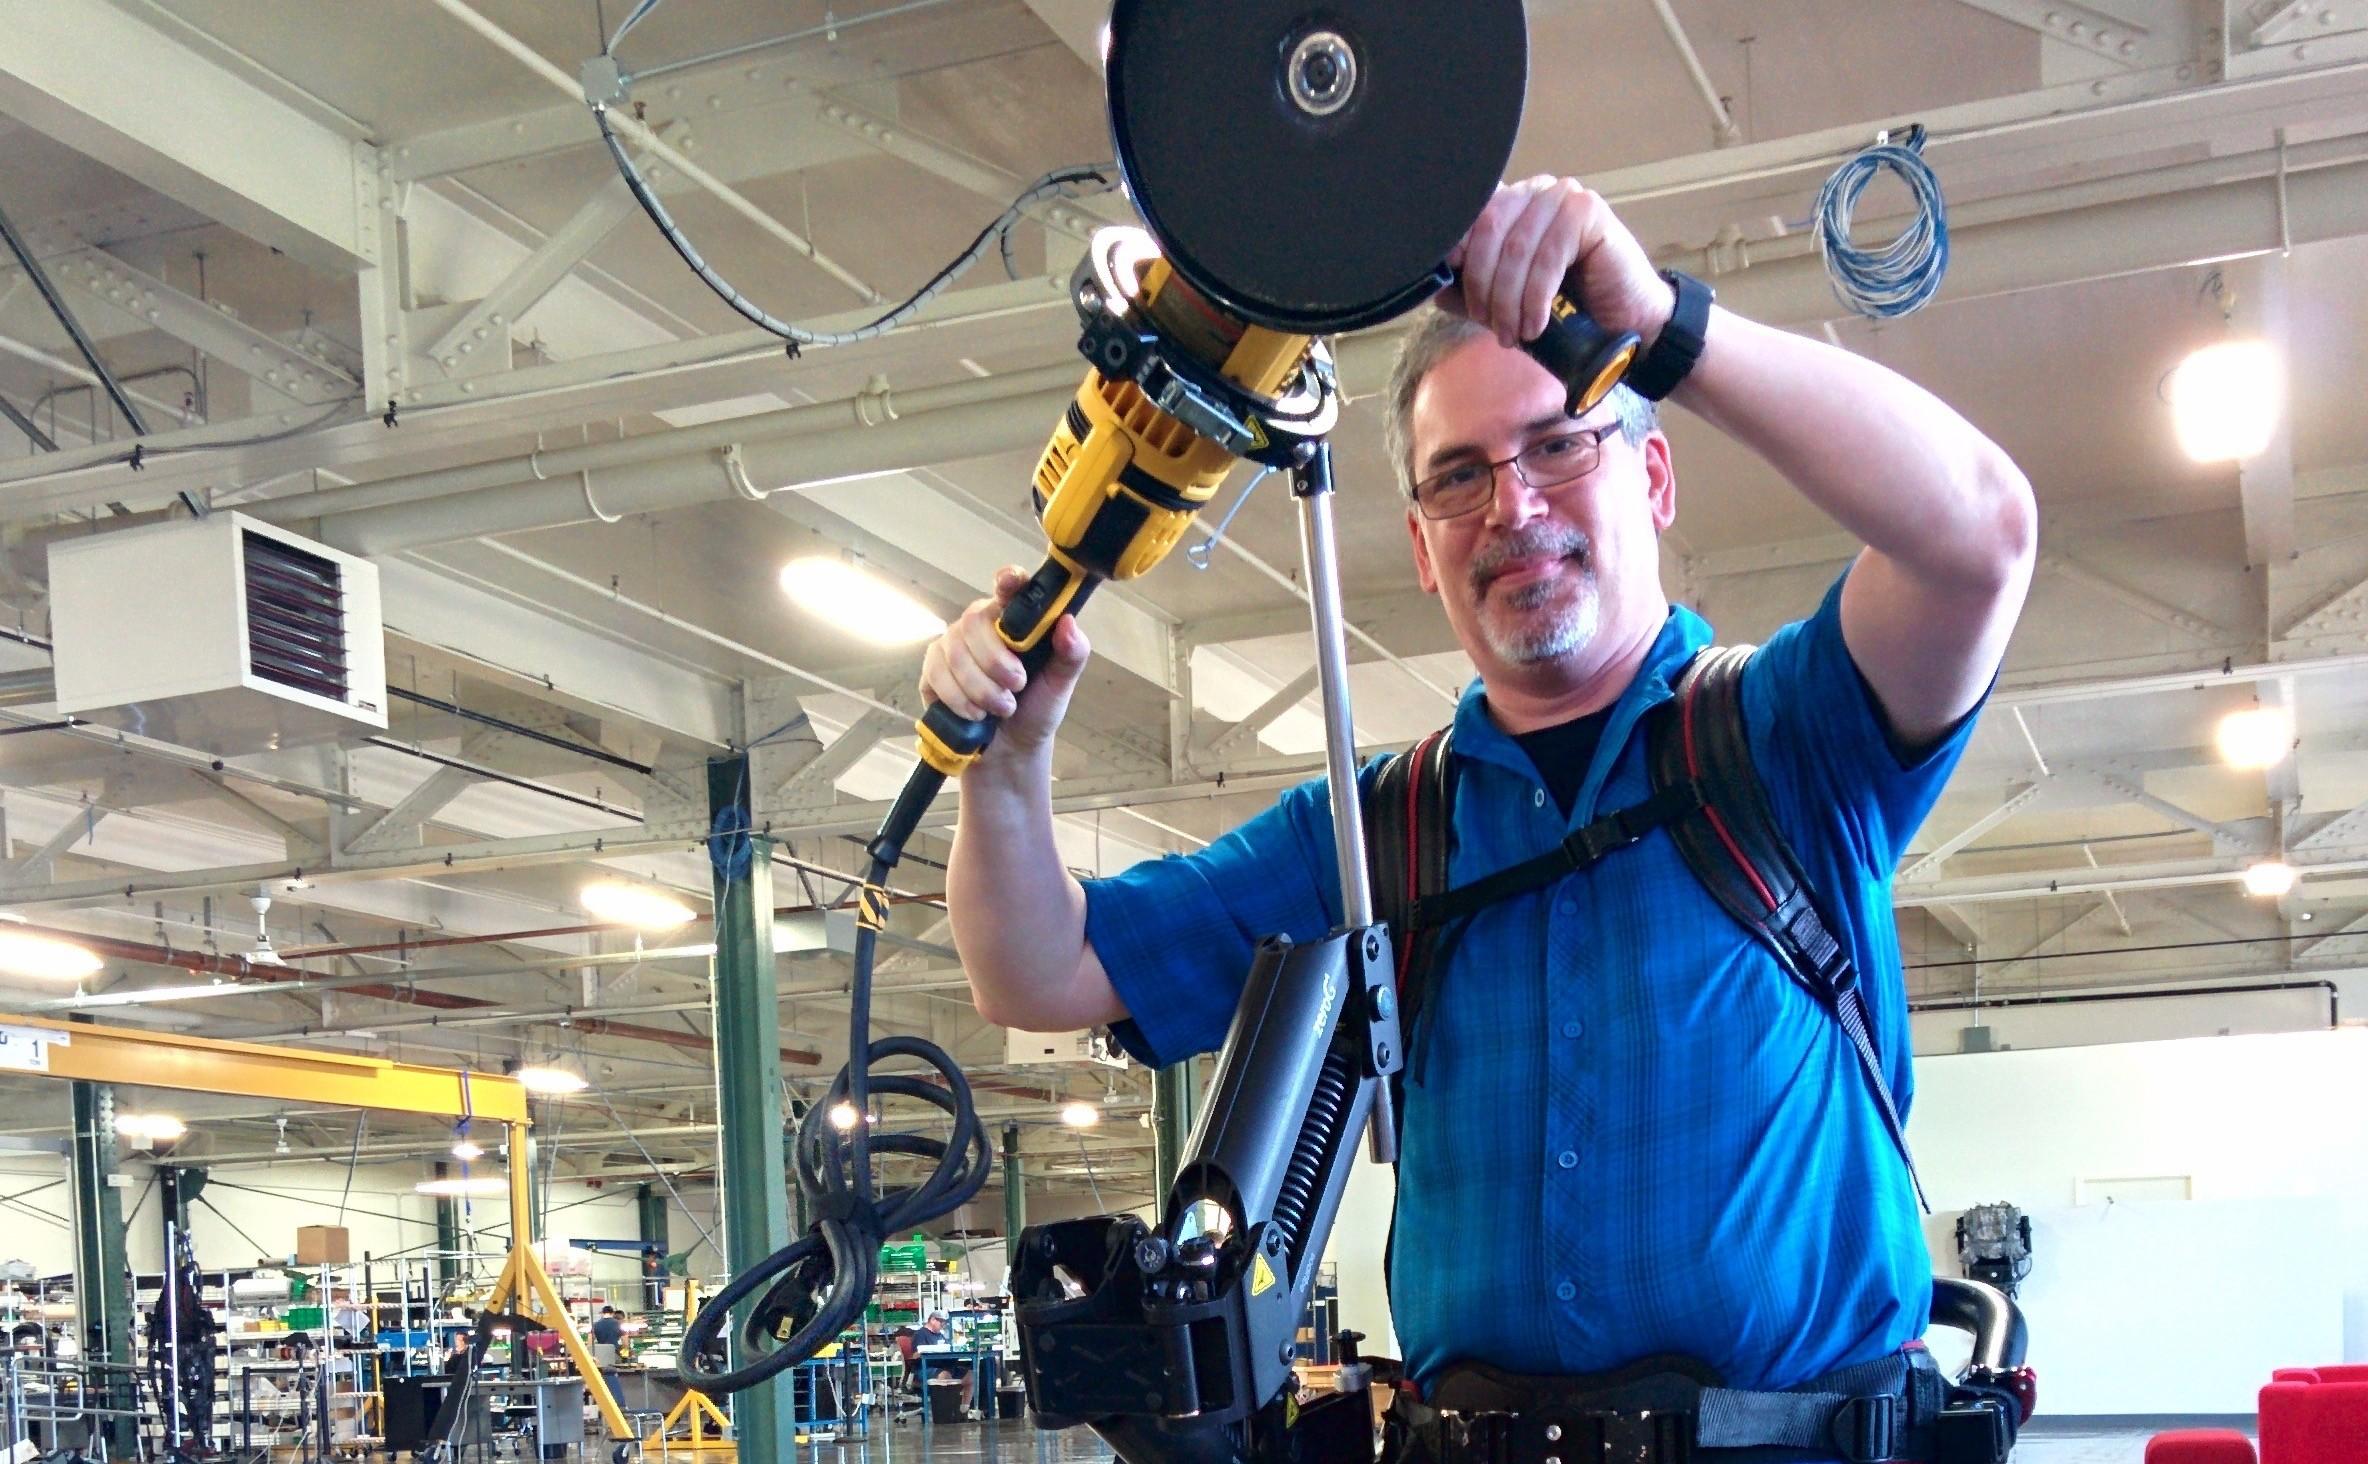 I Tried an Industrial Exoskeleton